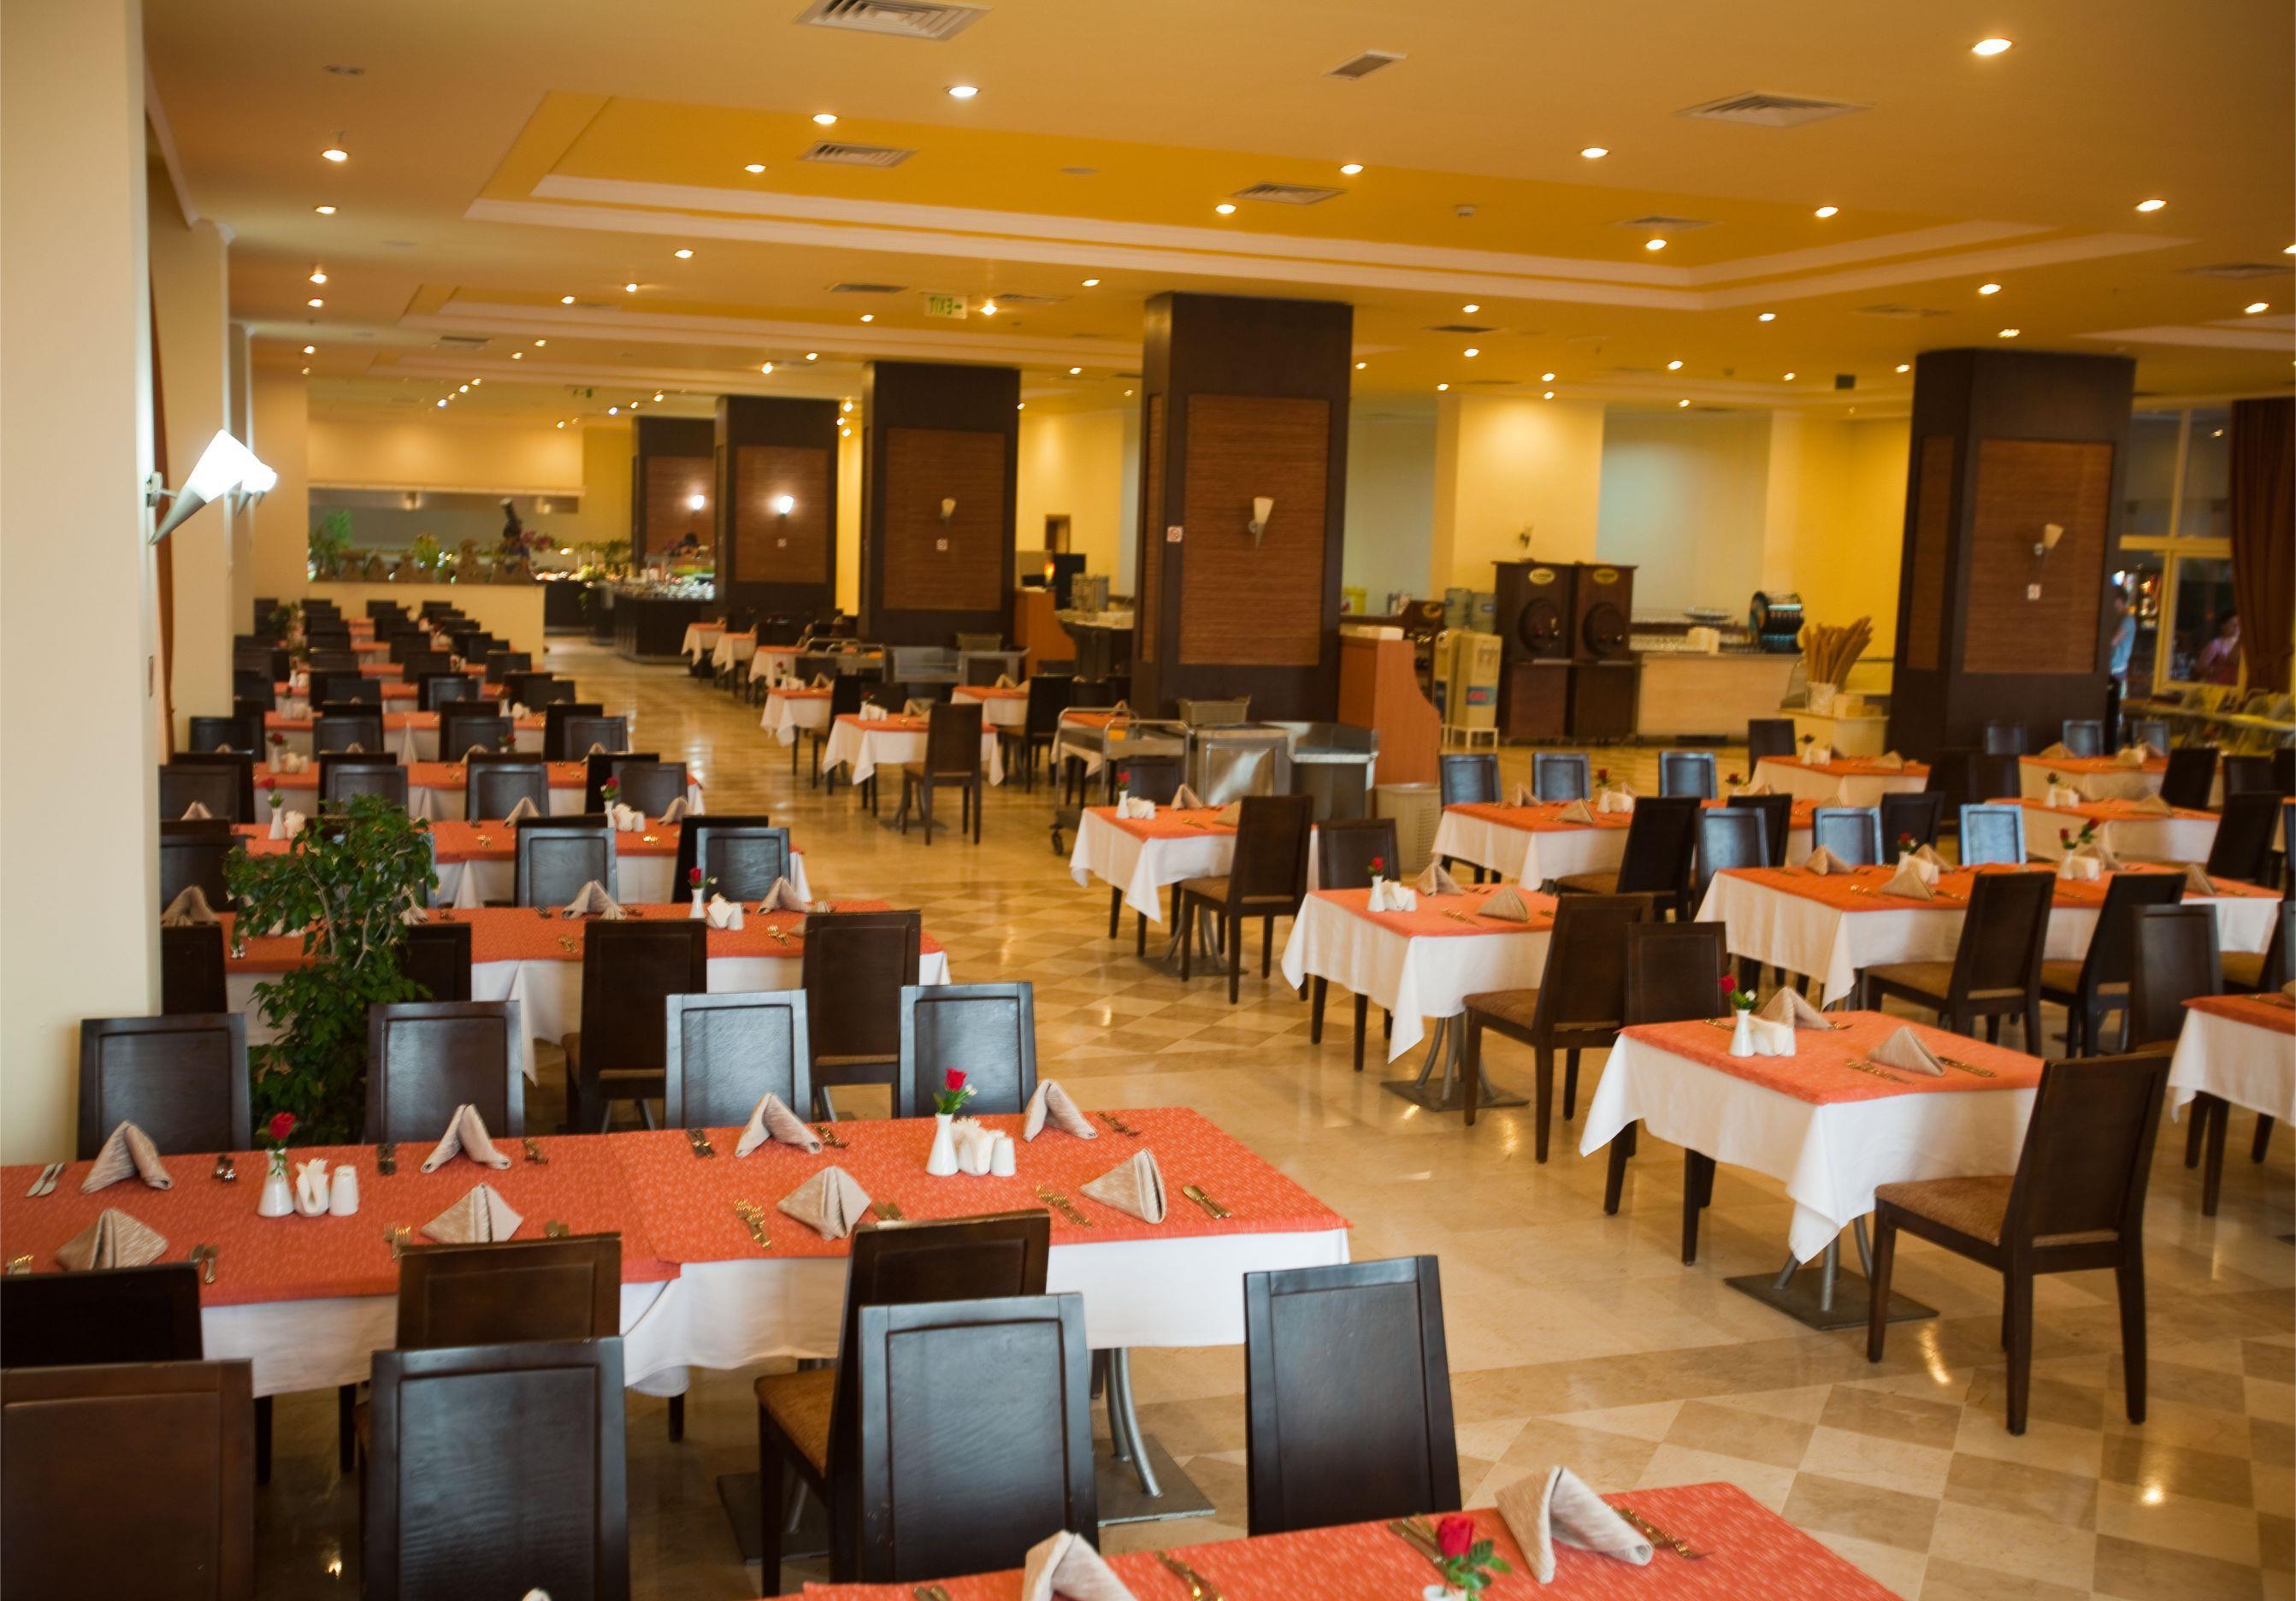 http://www.orextravel.sk/OREX/hotelphotos/stella-beach-hotel-alanya-general-0019.jpg